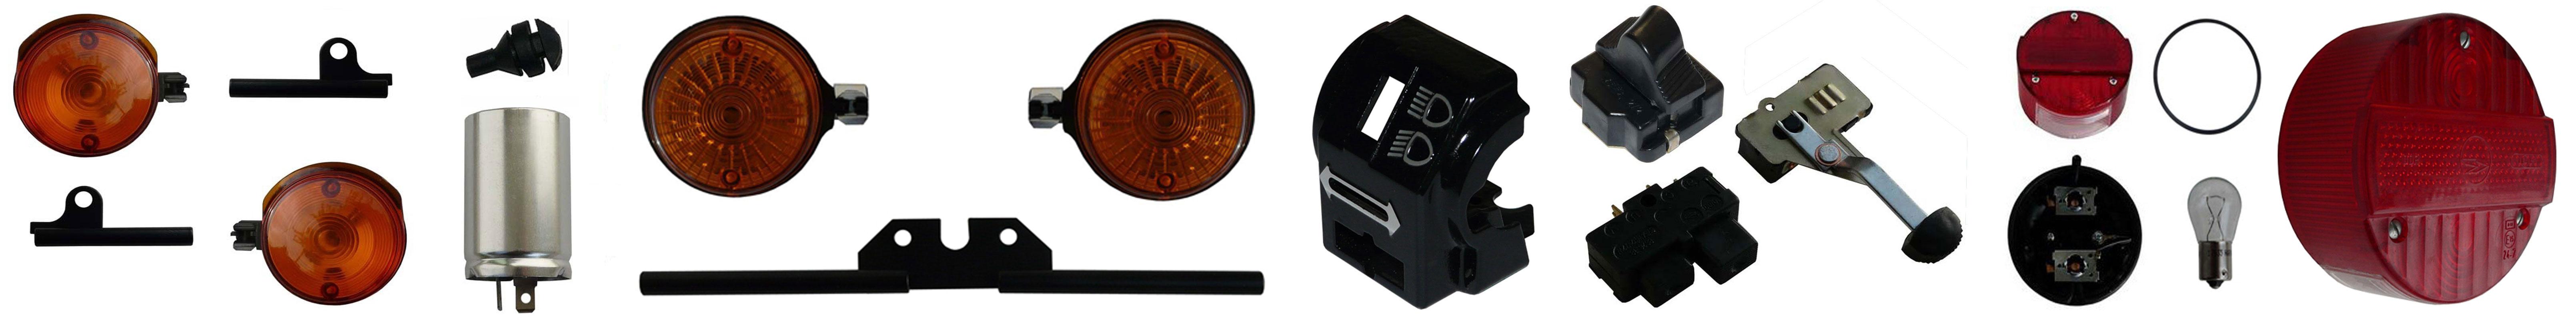 MZ ETZ 250 Ersatzteile Blinker Rücklicht